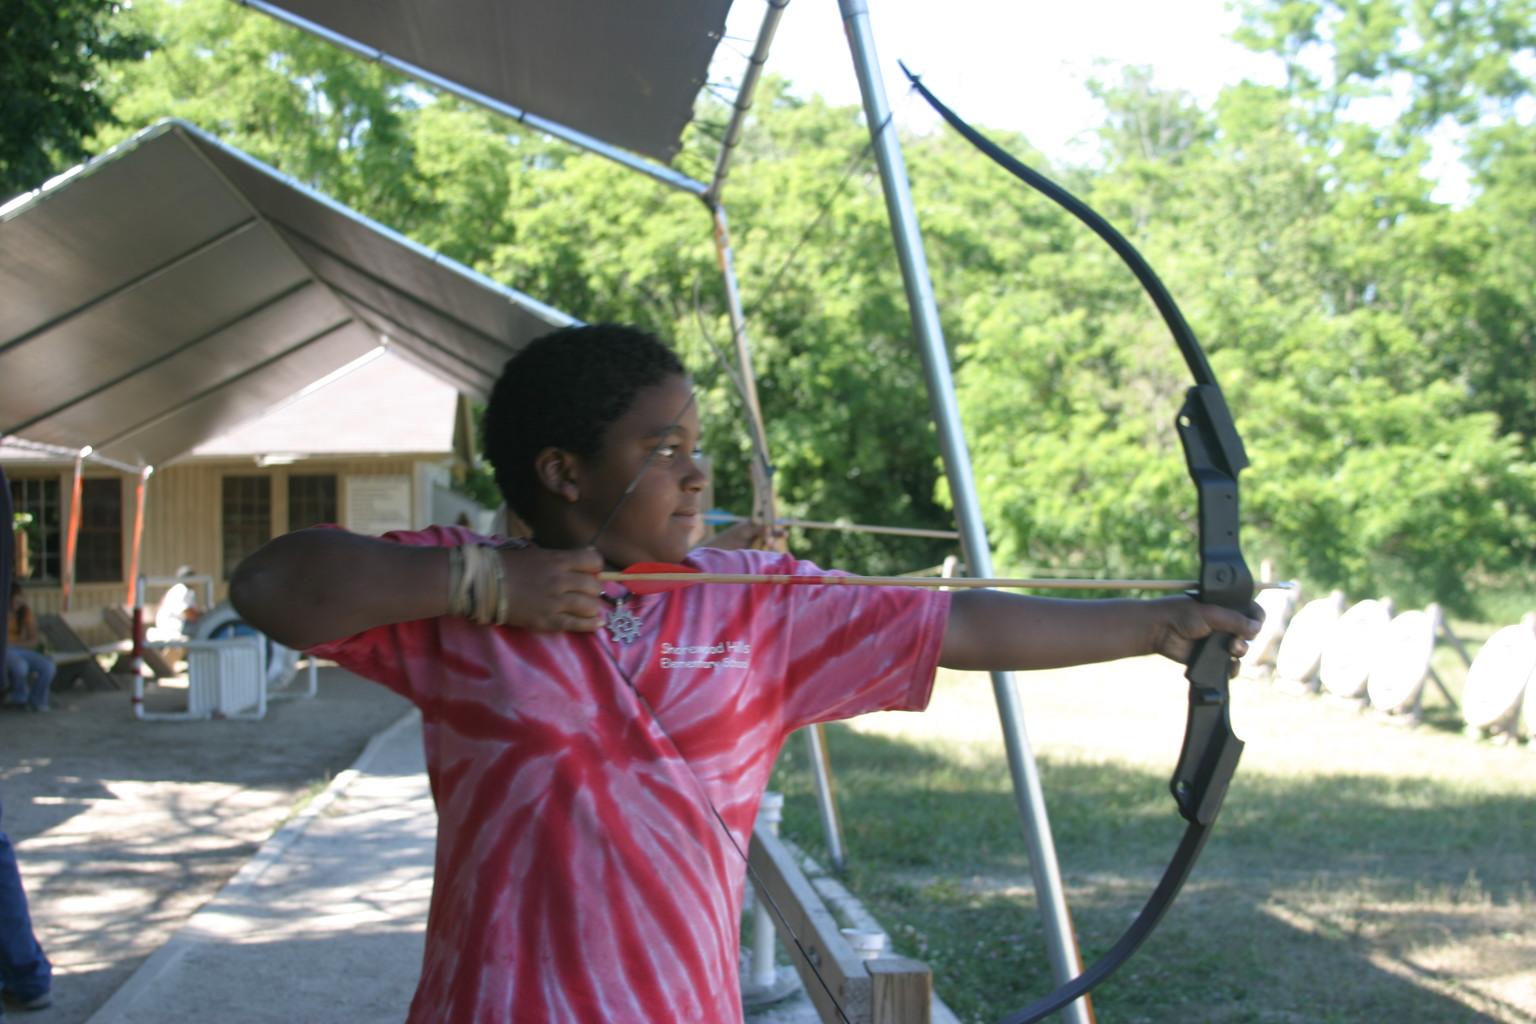 Summer Program - Arts and Crafts | Camp Anokijig